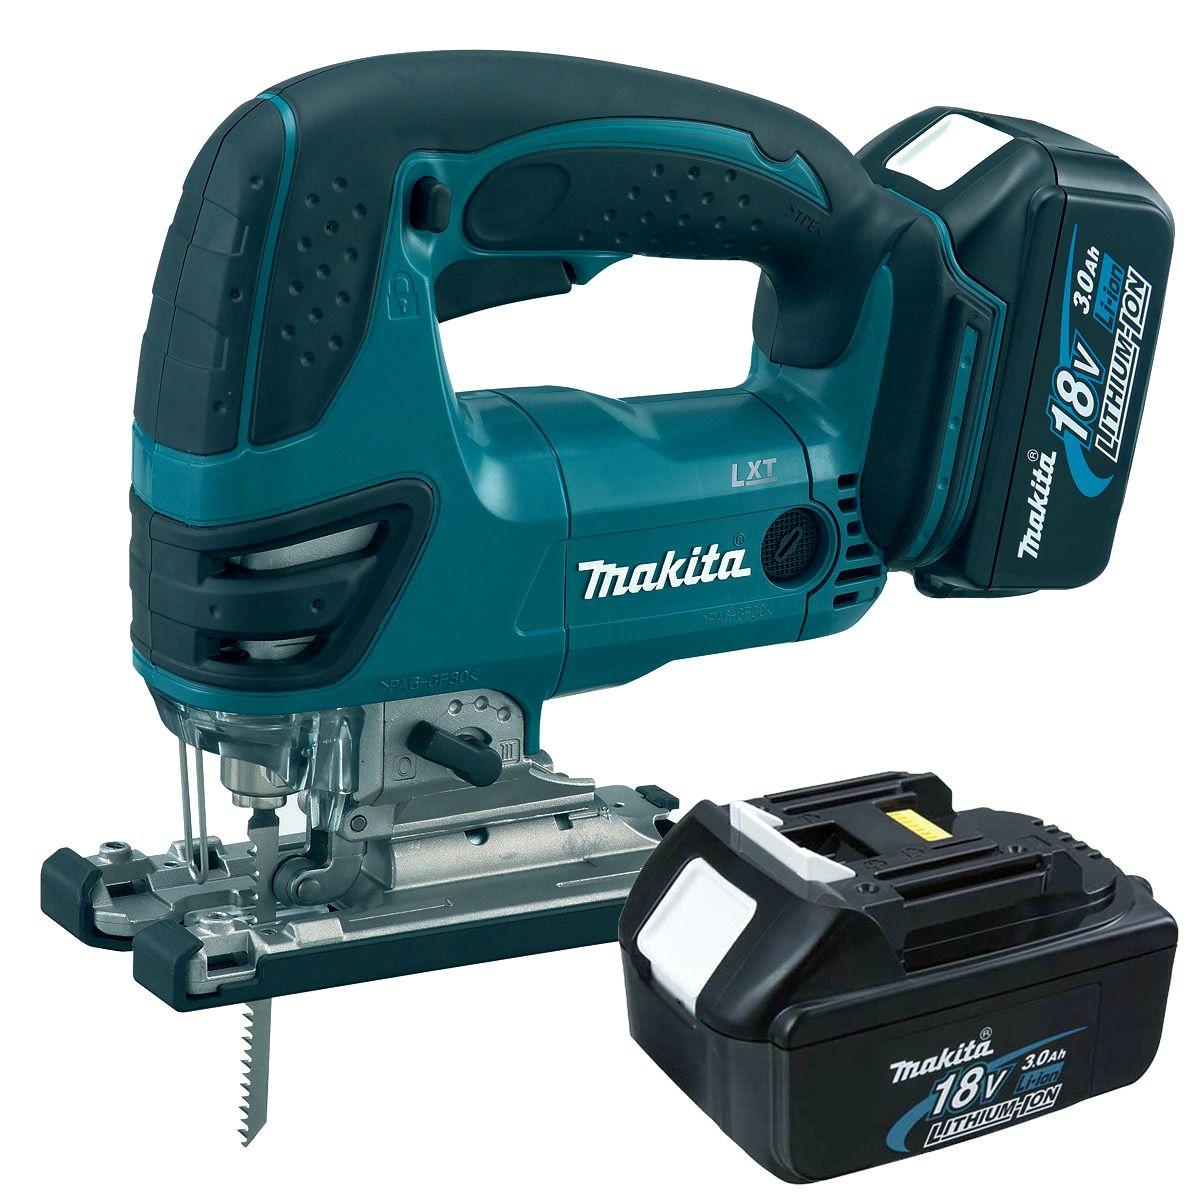 Cordless Jig Saw Makita Power Tools Power Tools Makita Tools Work Tools